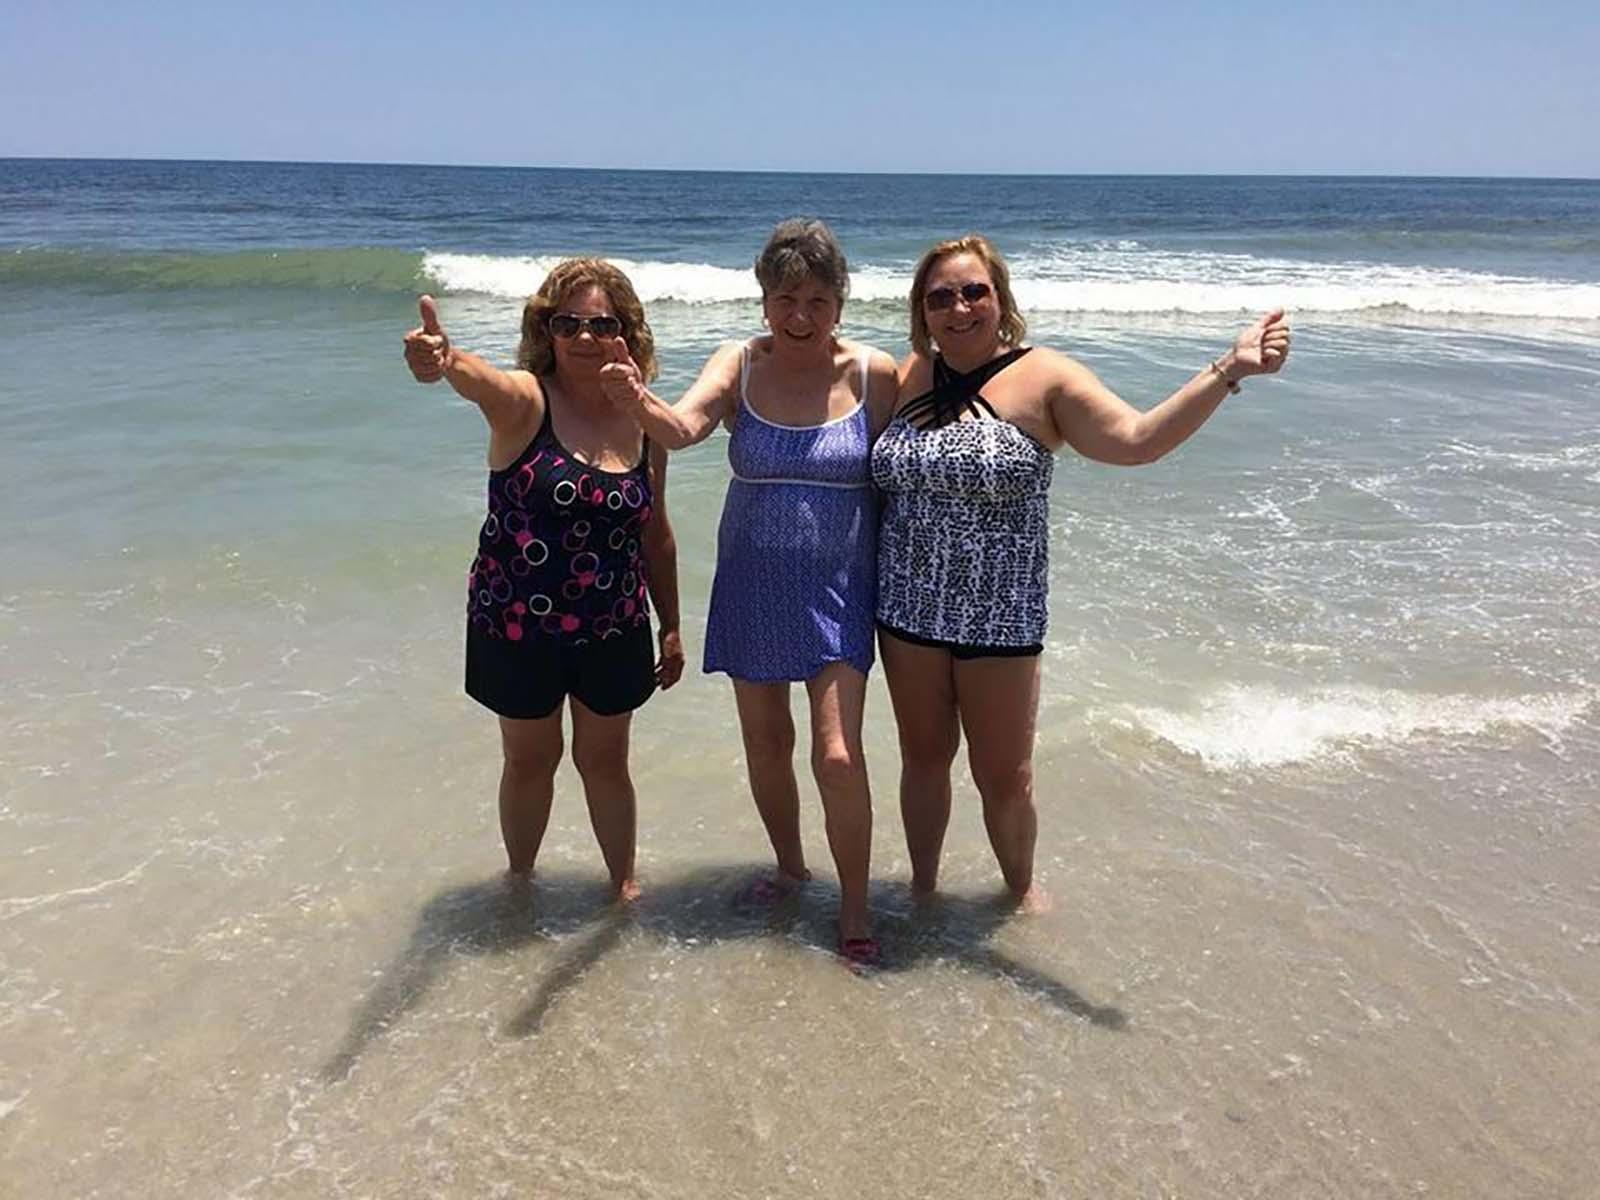 Three older women smiling in ocean